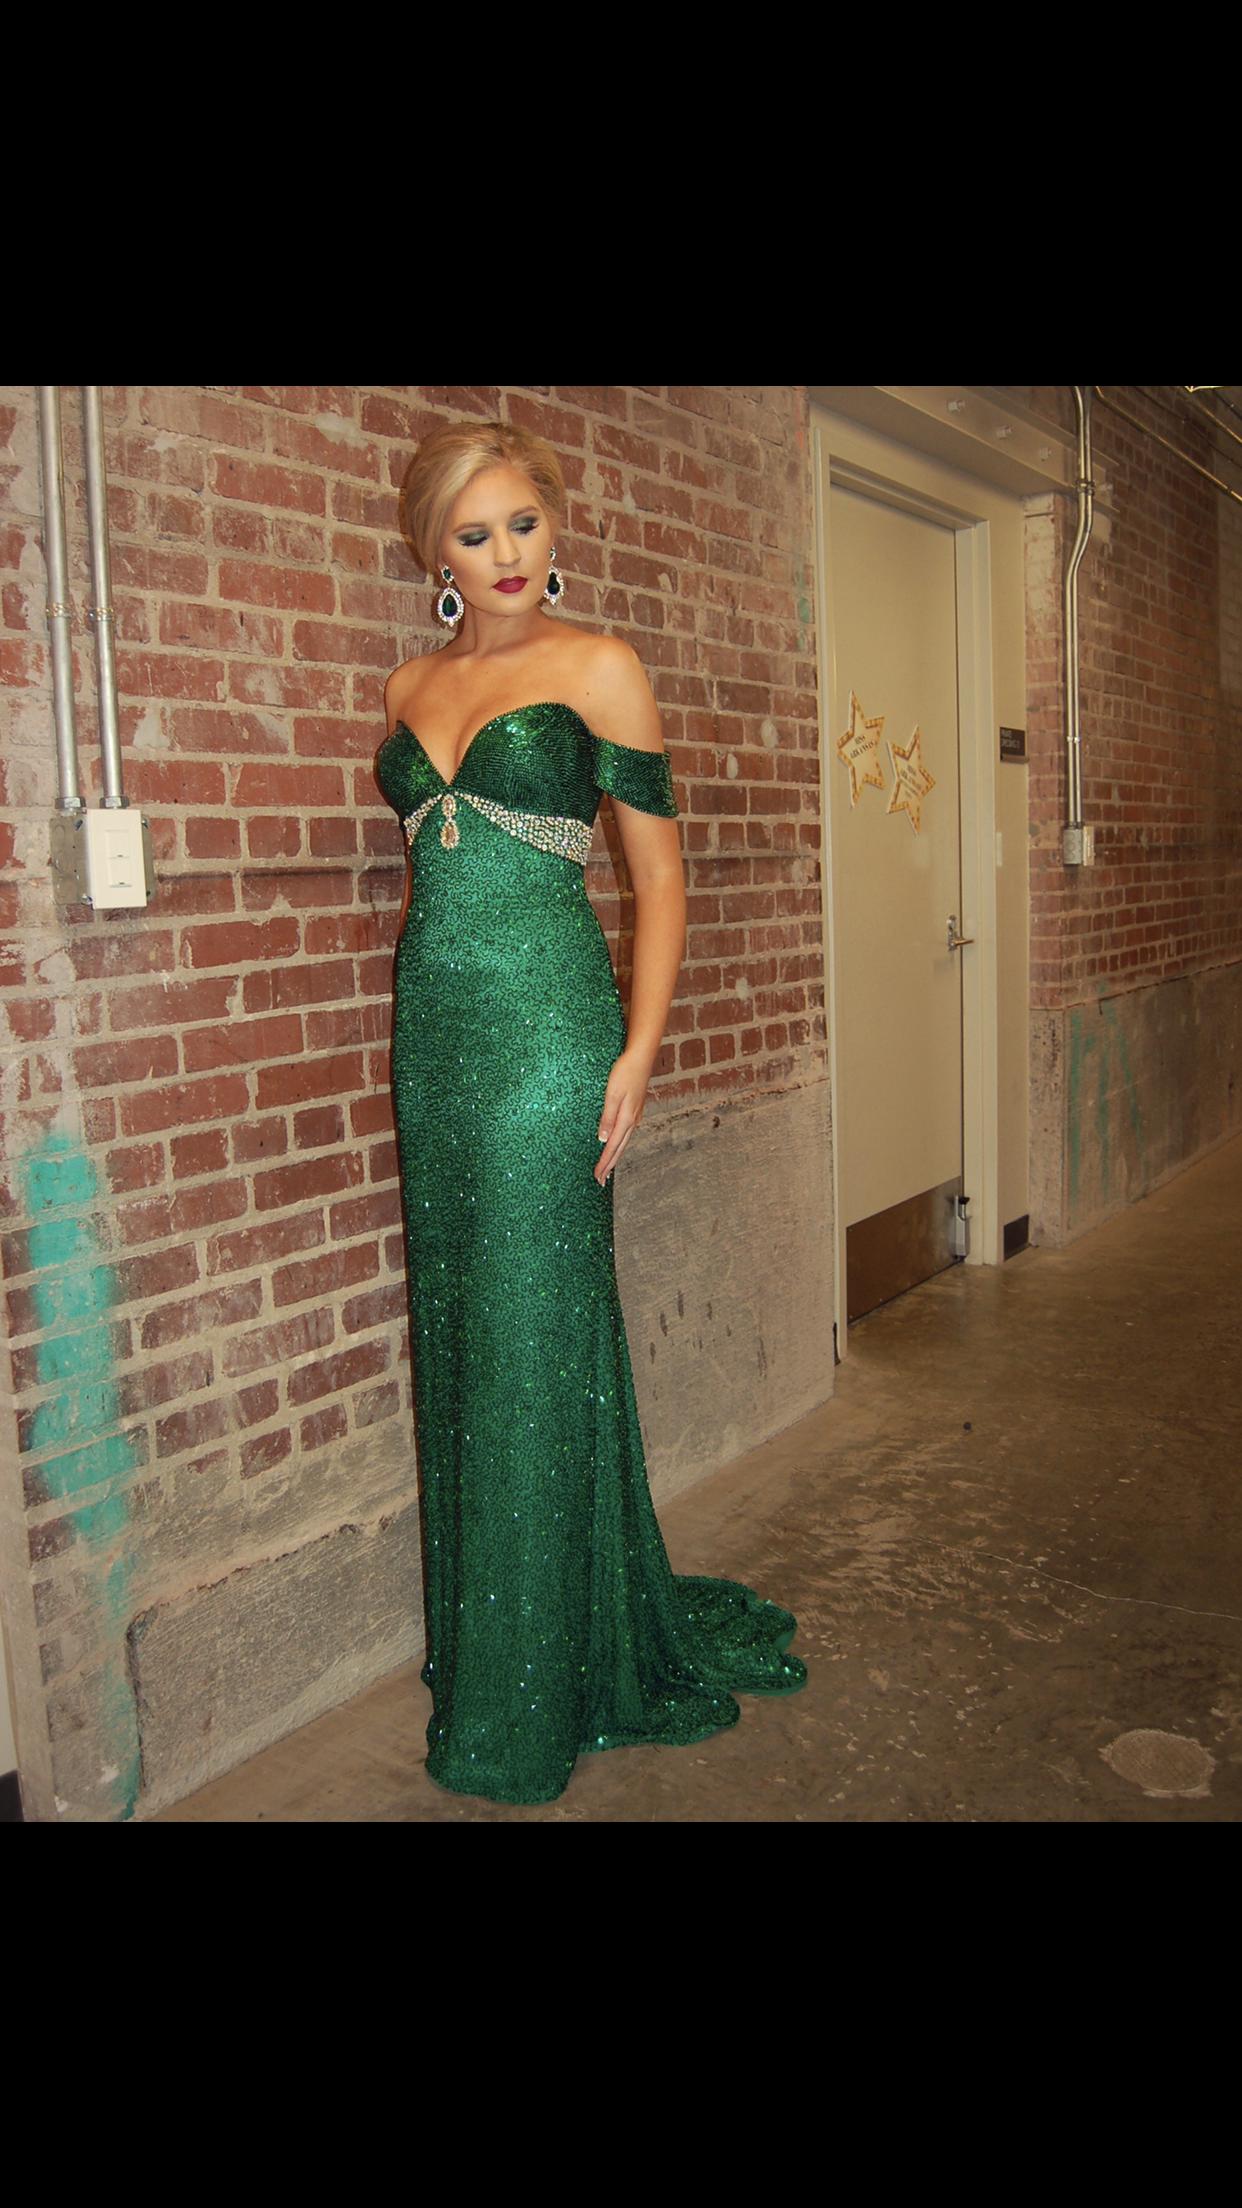 Emerald Green Stephen Yearick Evening Gown